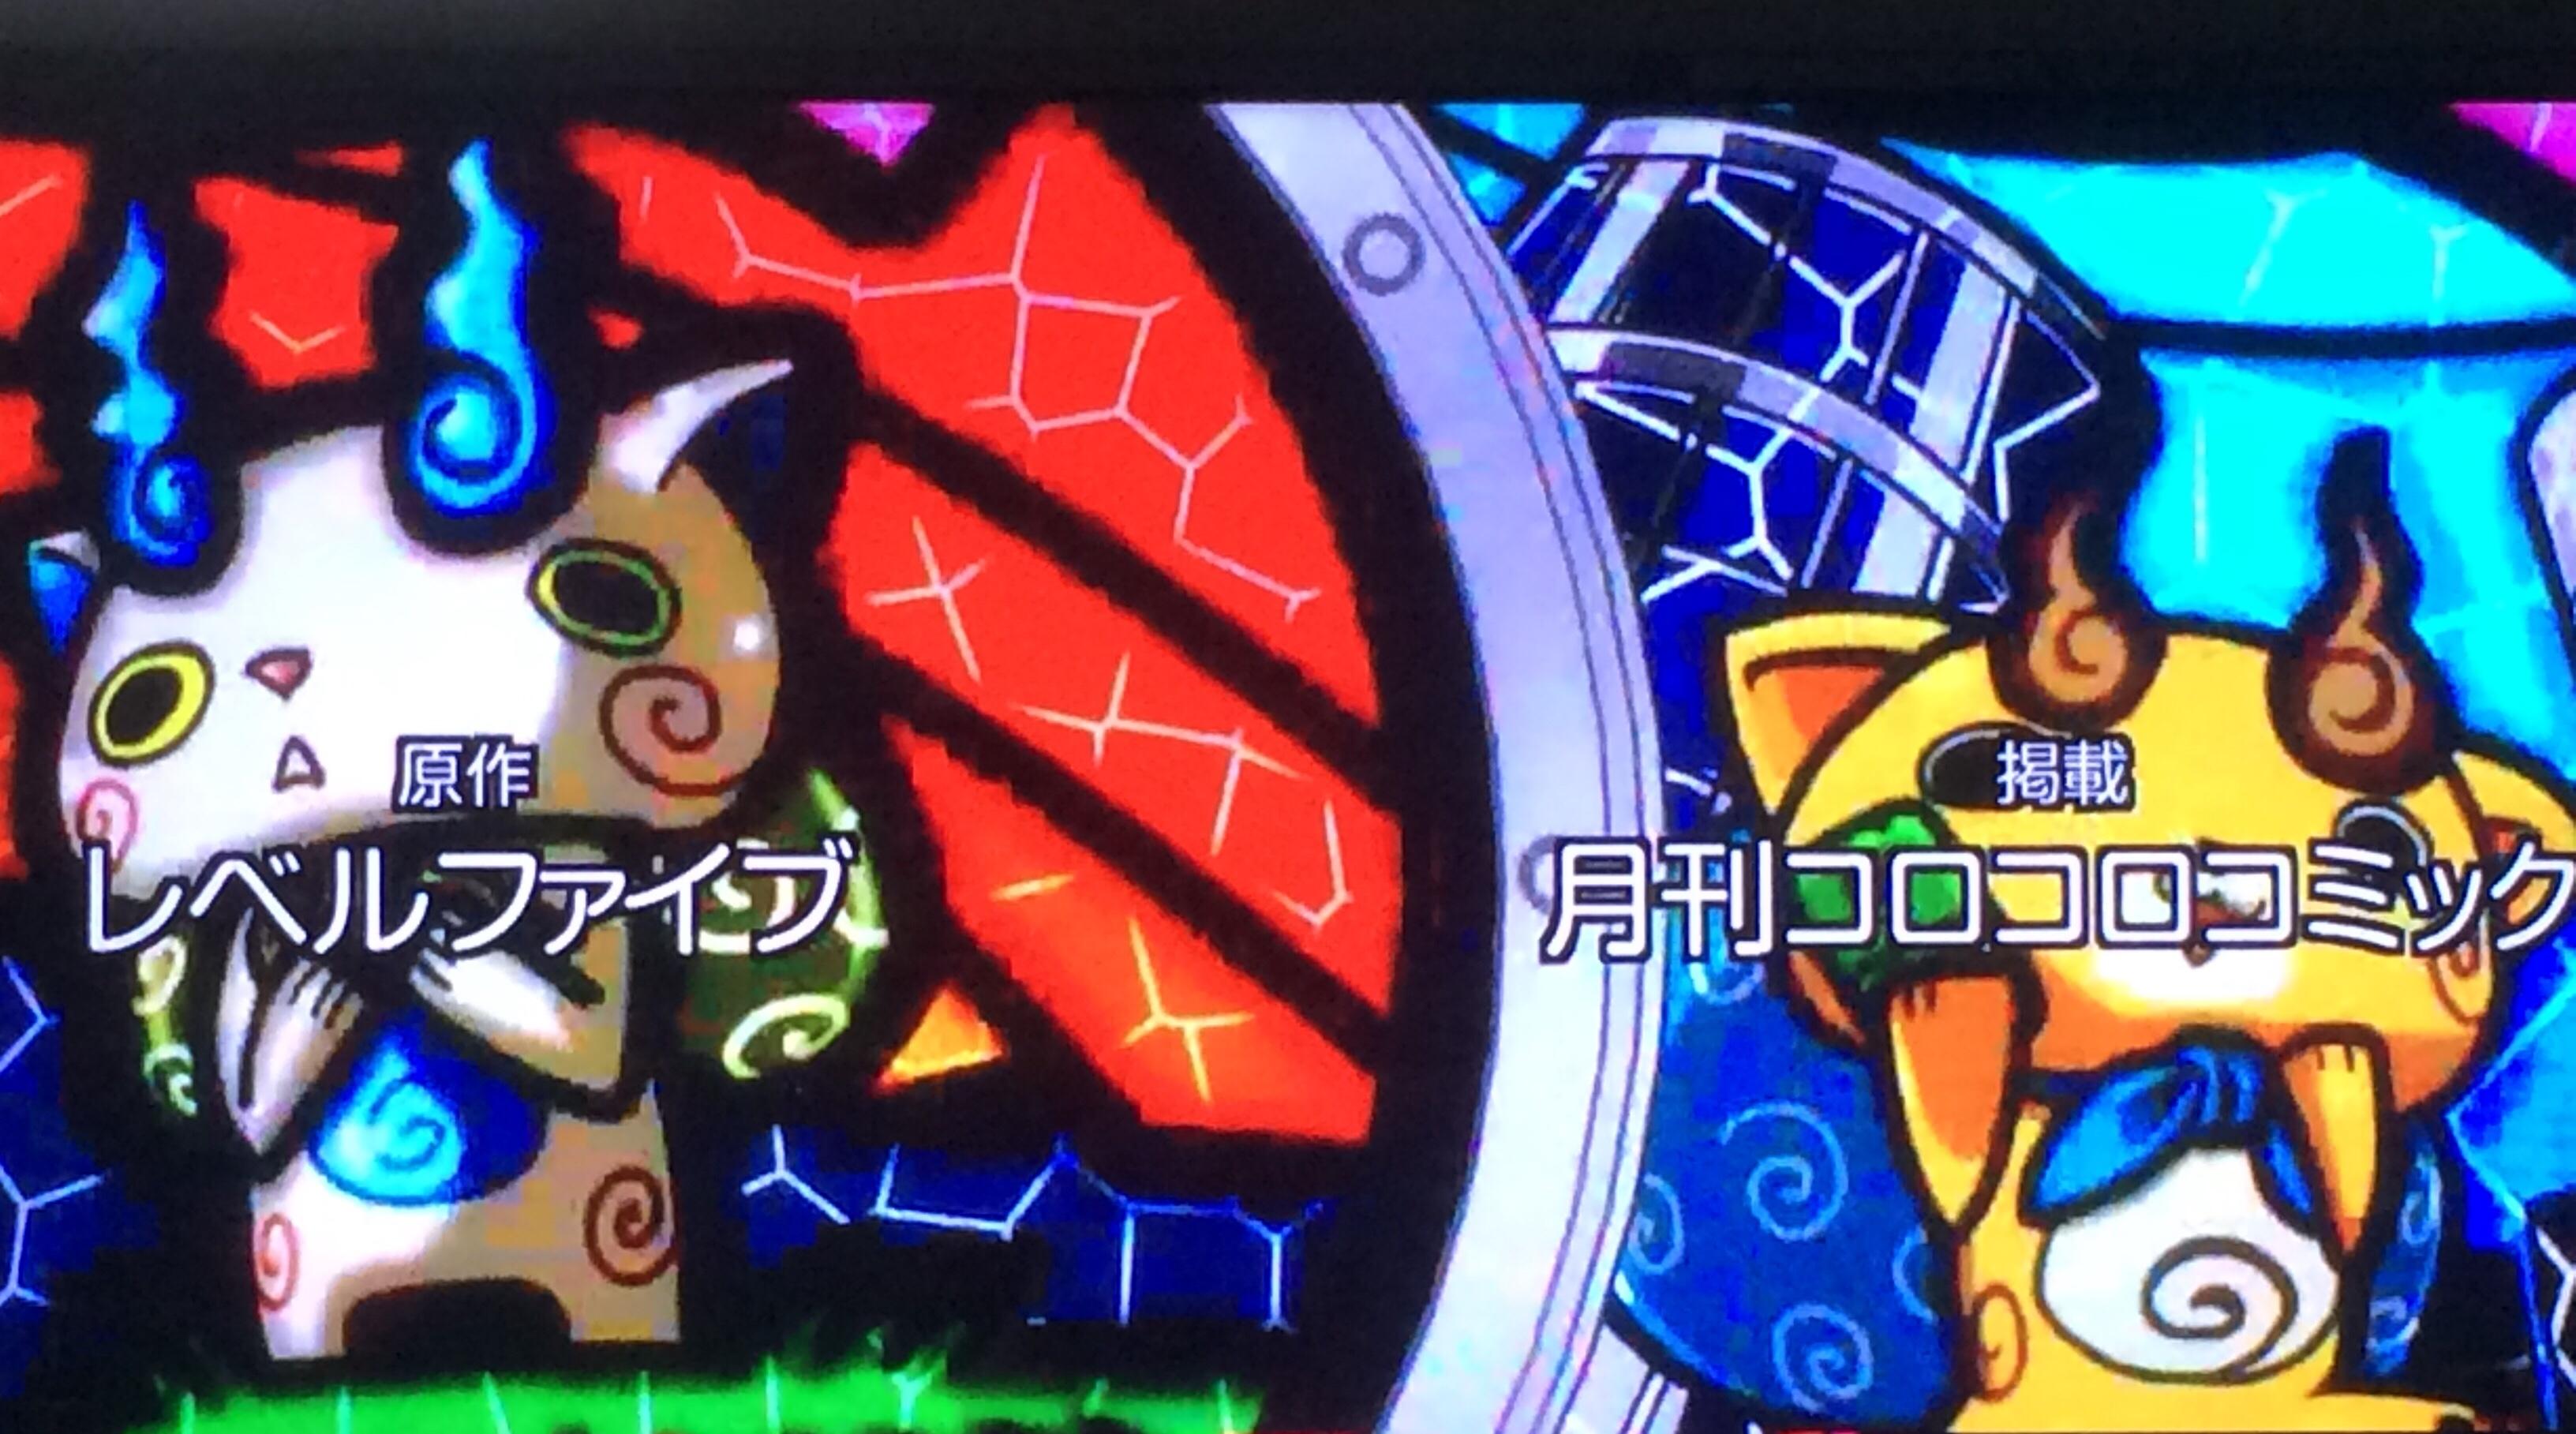 fc2blog_2014111011190560f.jpg